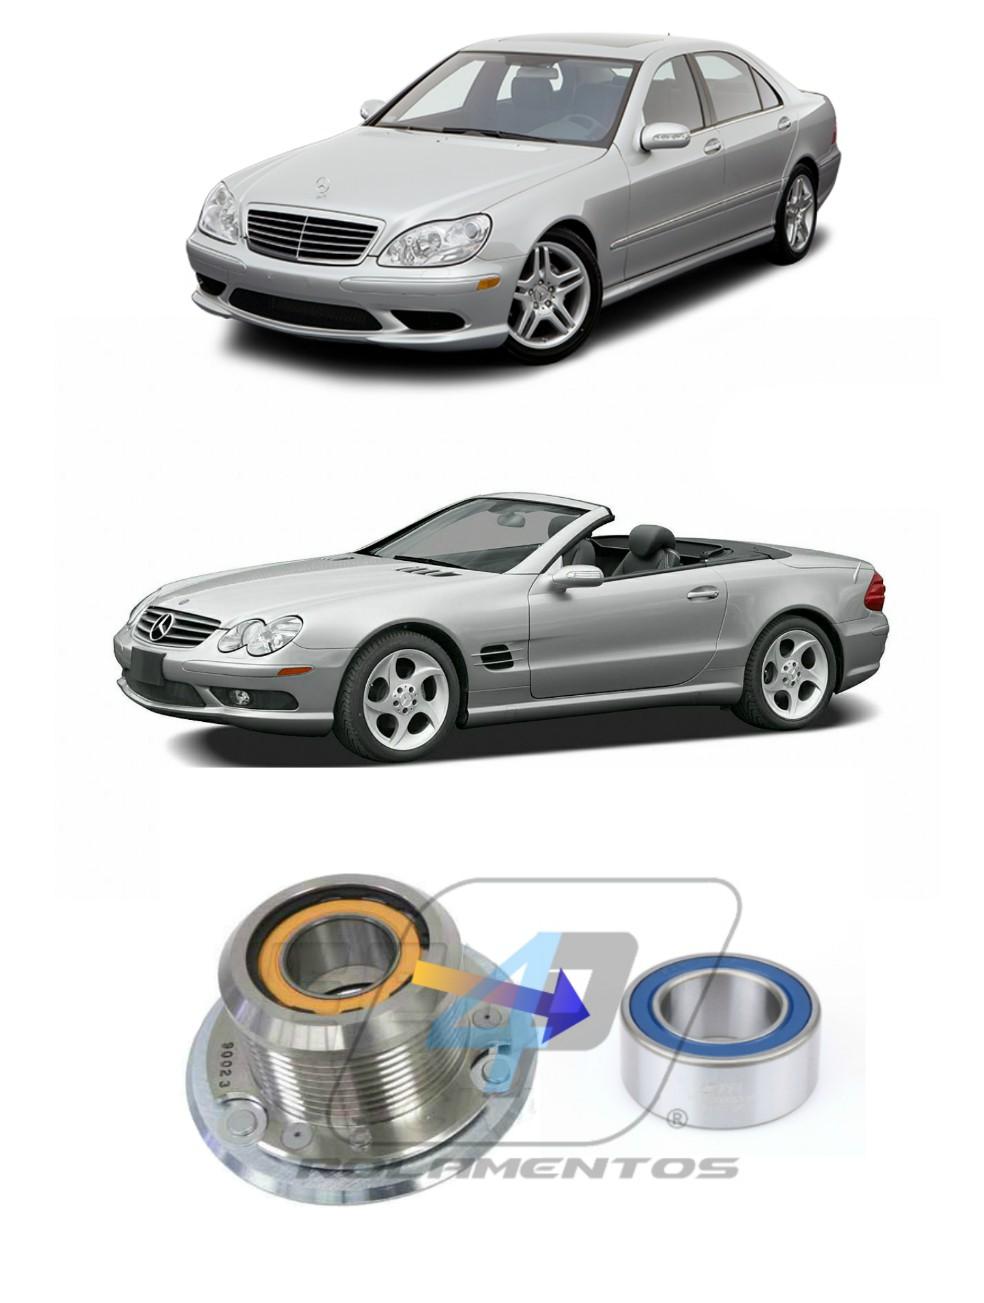 Rolamento do Supercharger Mercedes Benz S/SL 55 AMG de 2003 até 2006